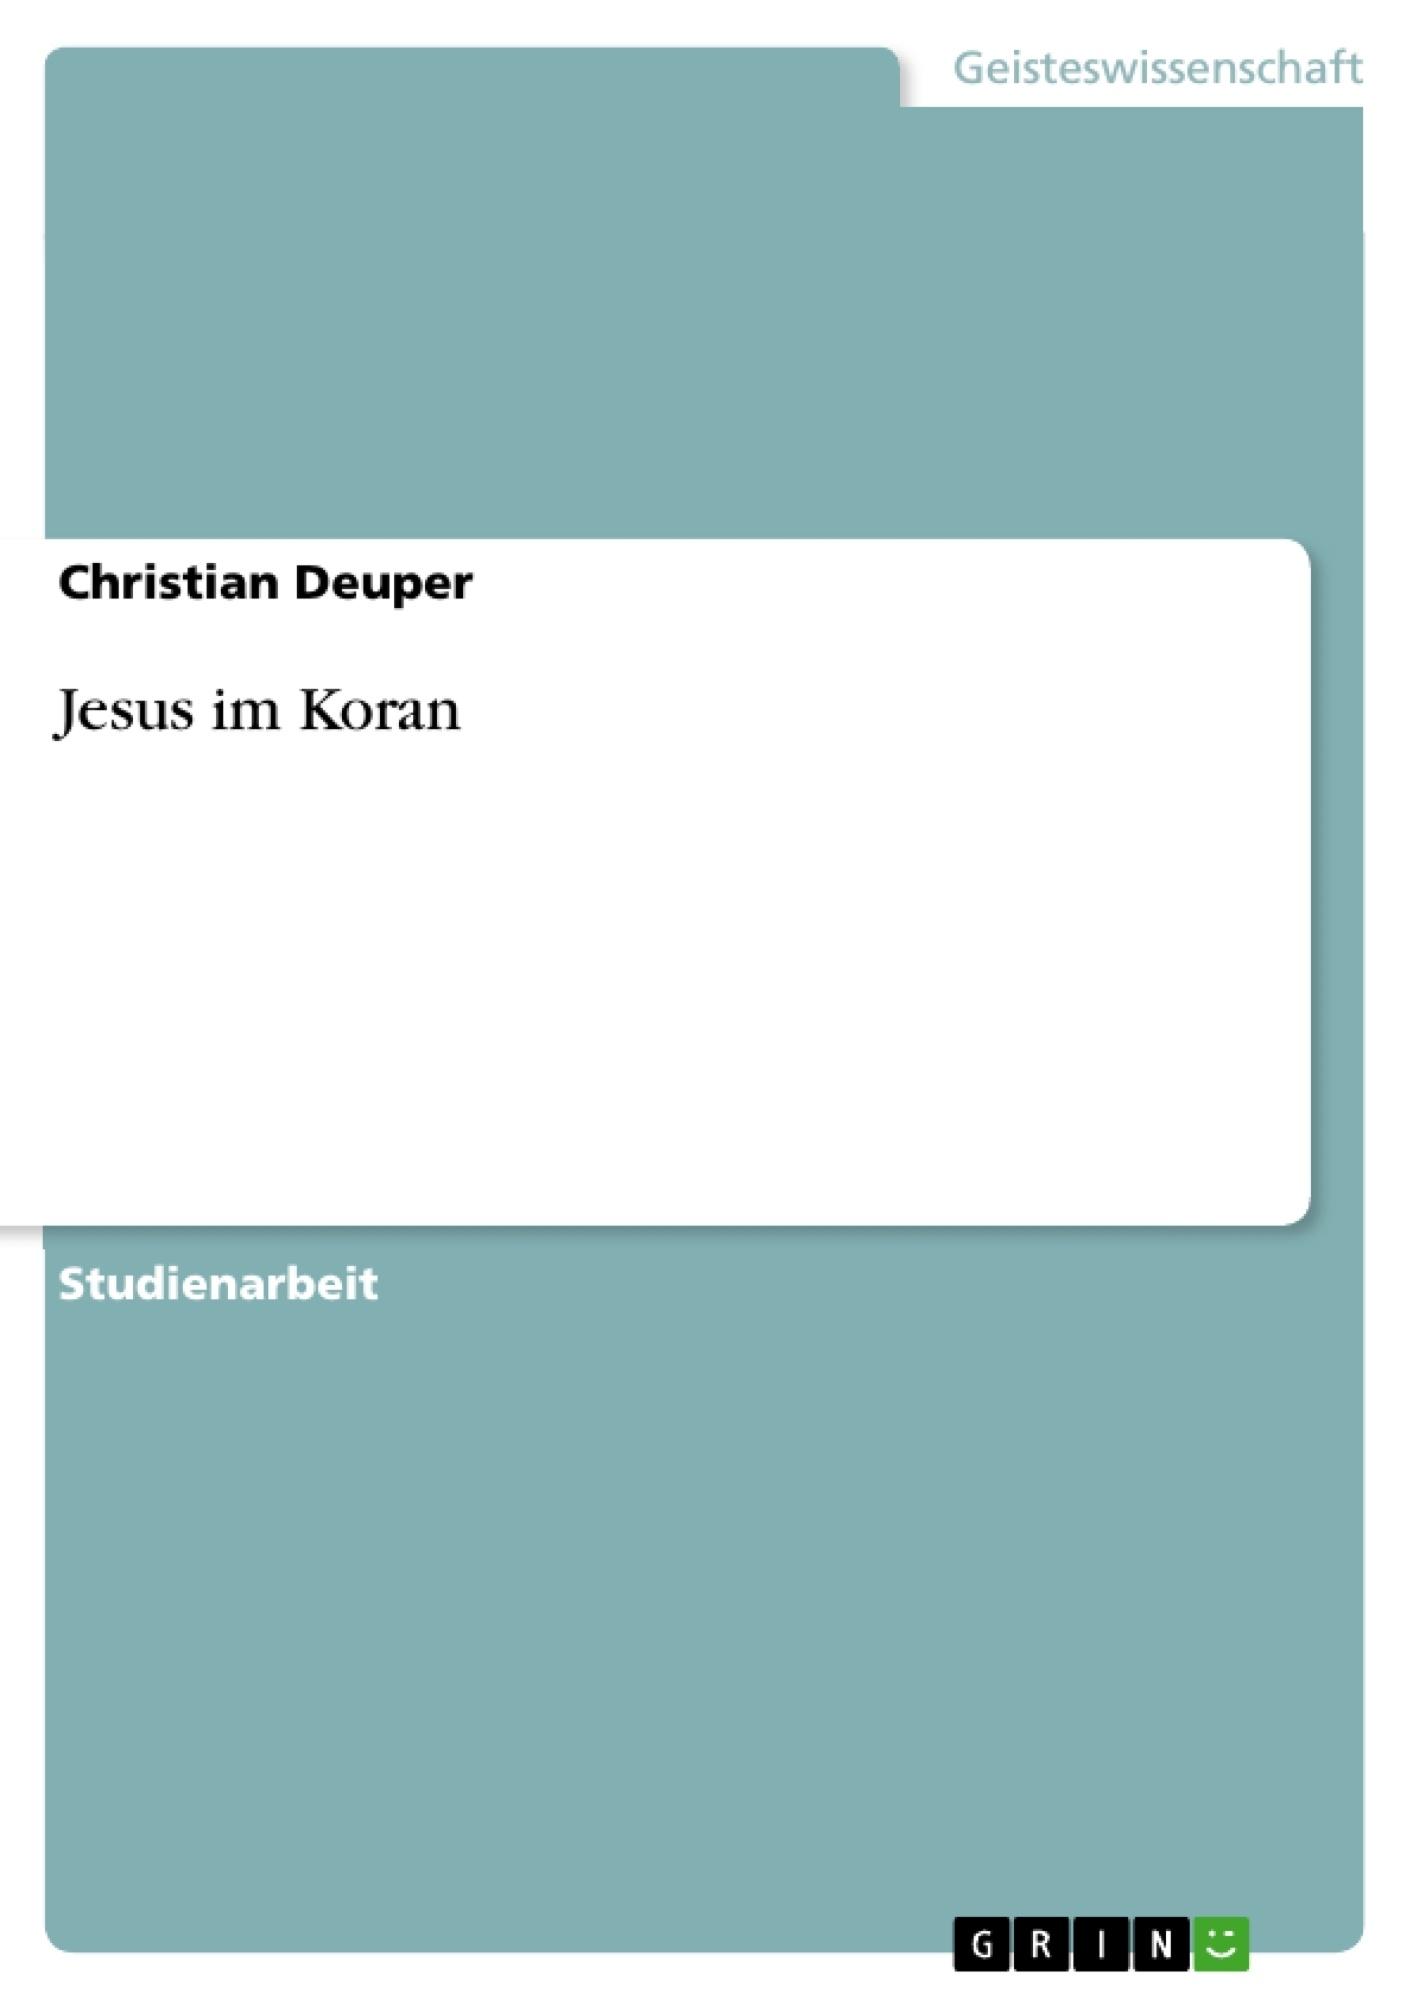 Titel: Jesus im Koran